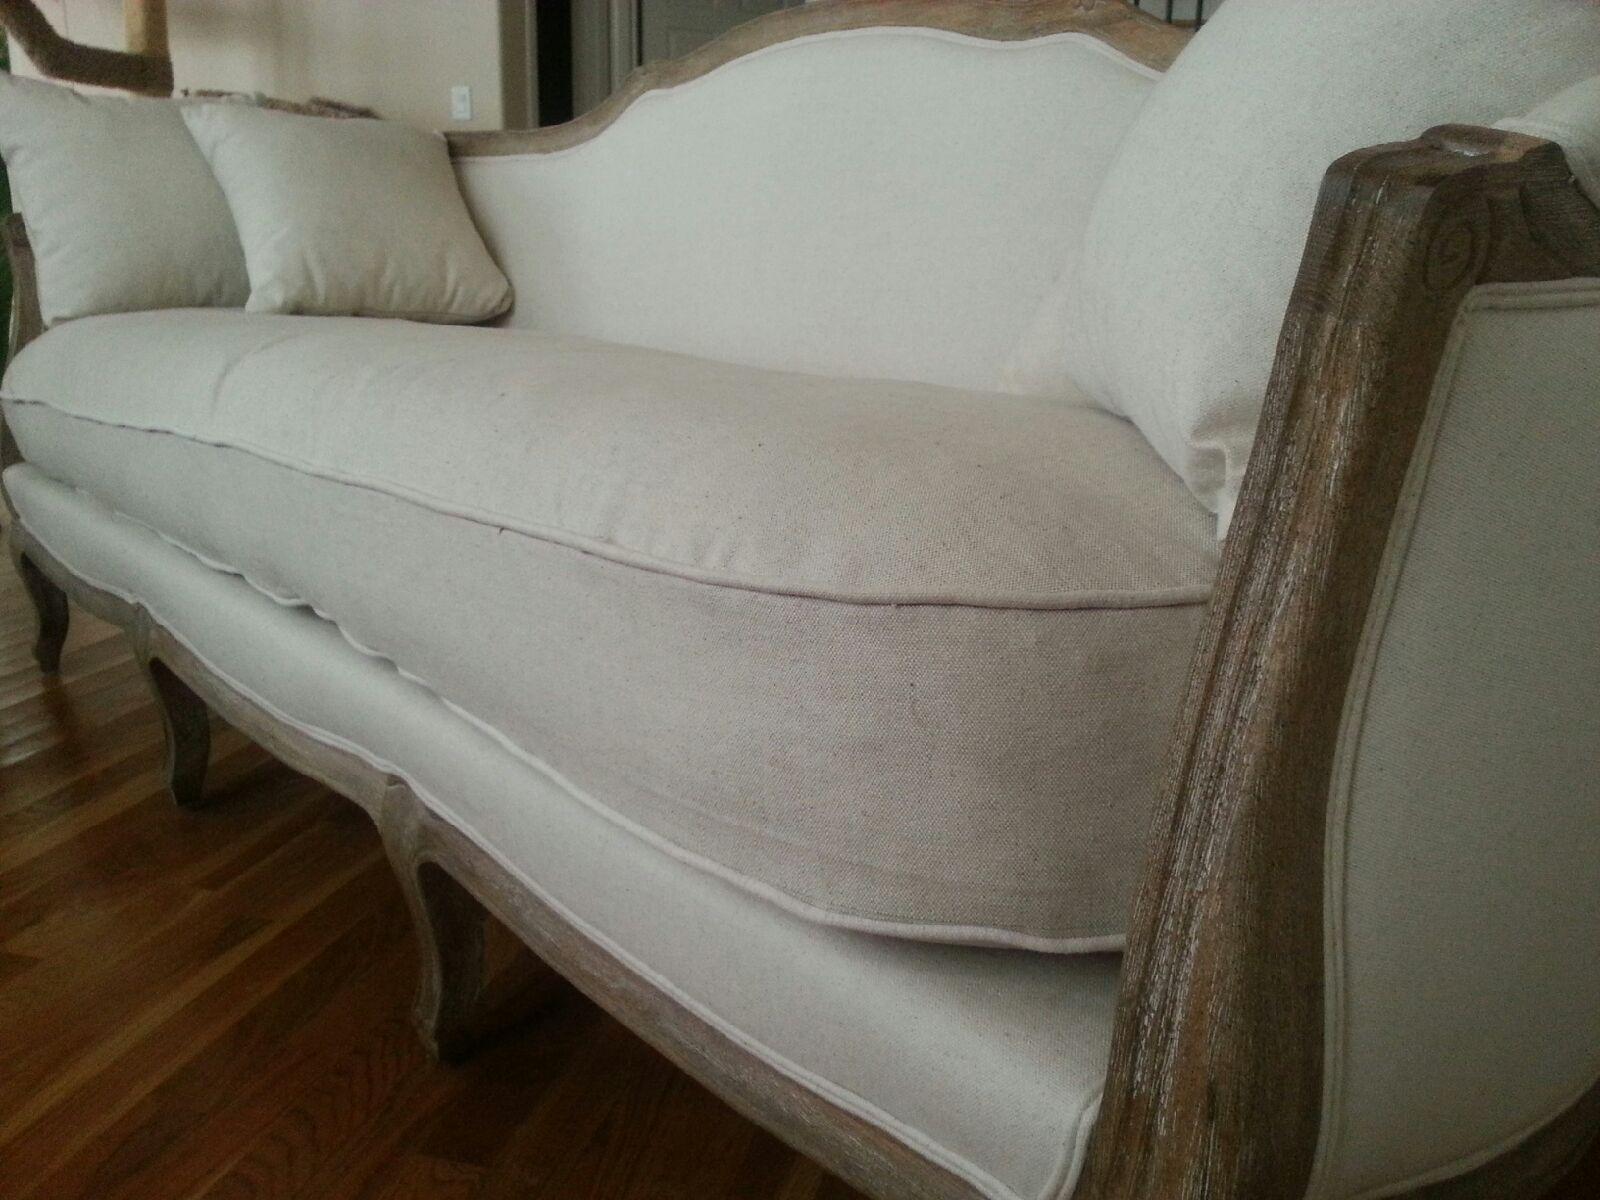 Reupholster Sofa Cushions Do It Yourself Divas Diy Fabric